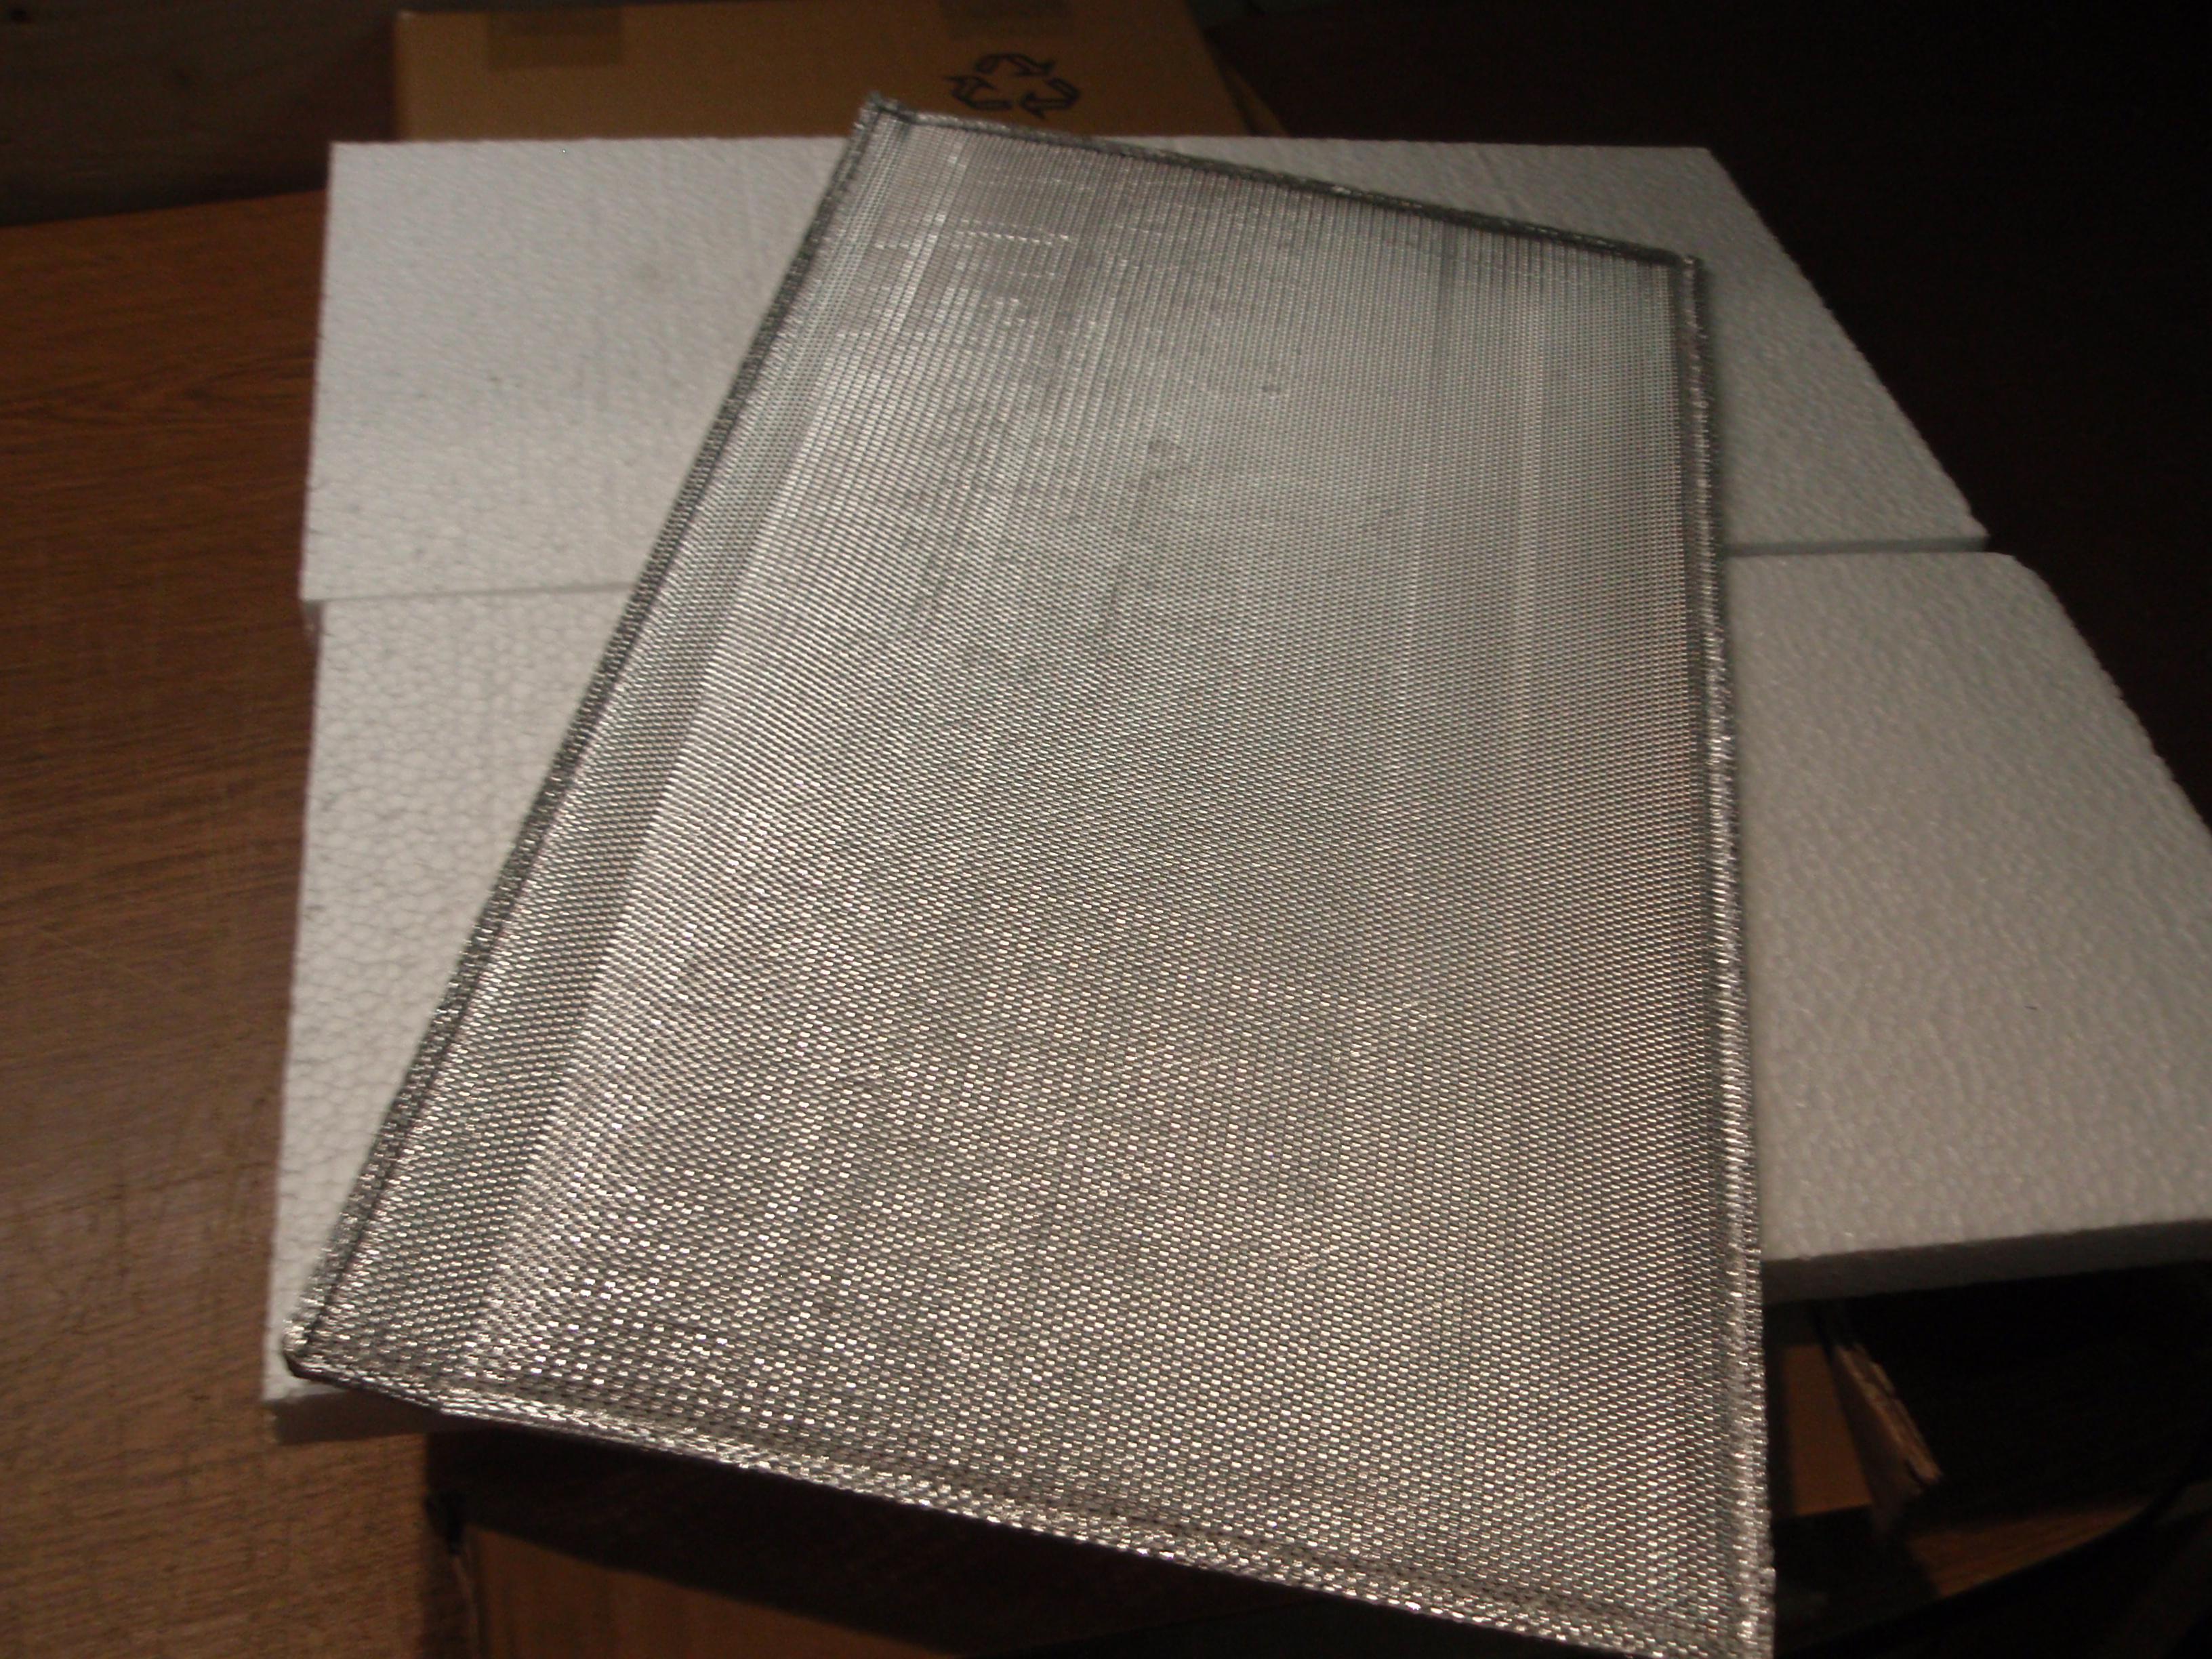 FABER Filtr kovový MILL 50 cm + doprava zdarma